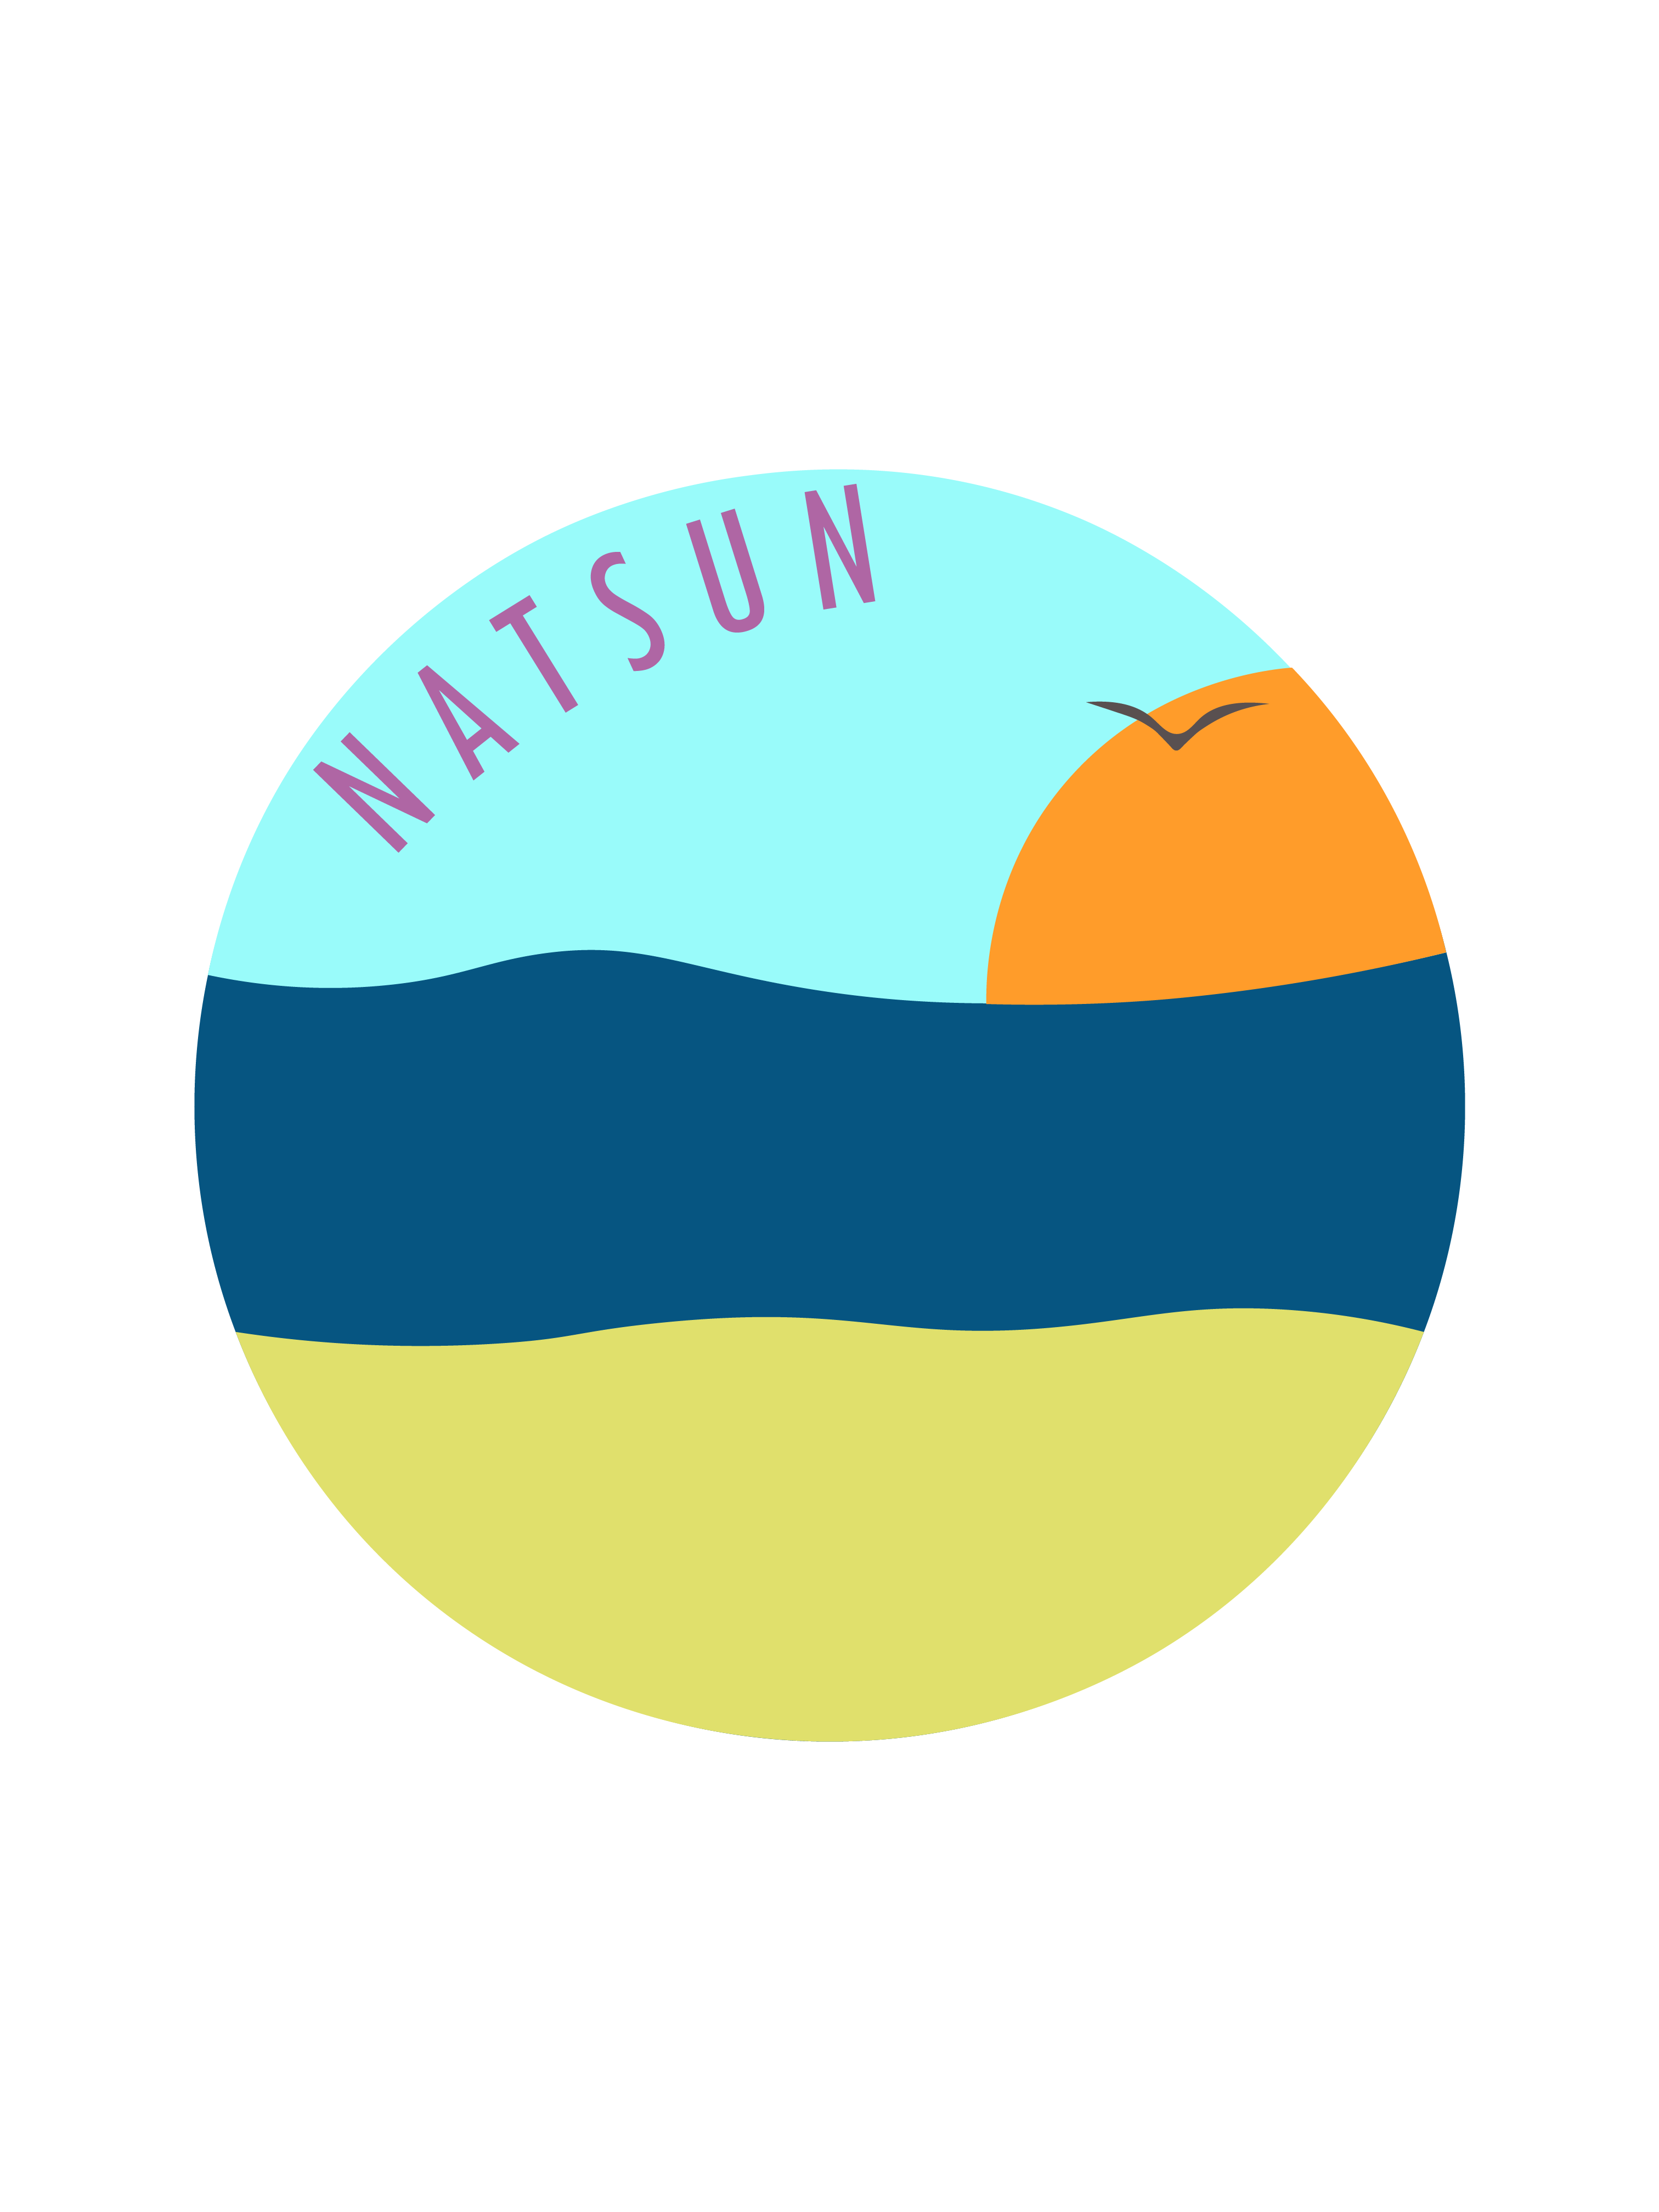 NATSUN Vera Playa   Apartamentos Naturistas